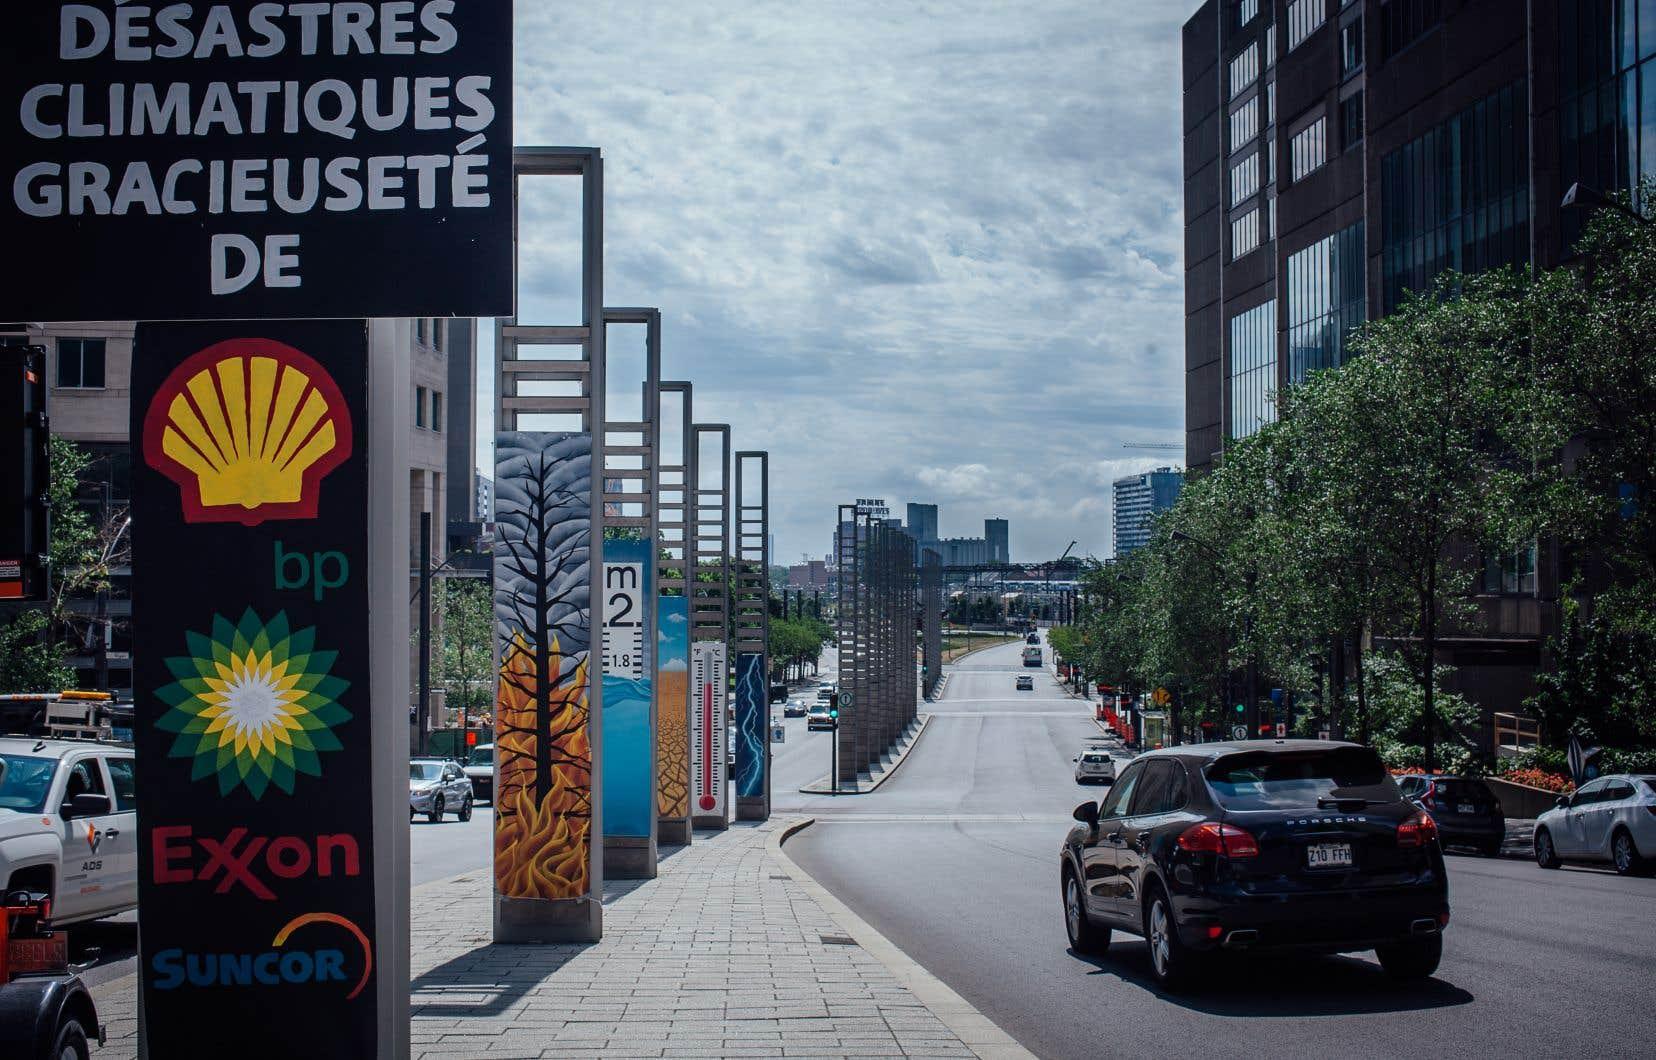 Installation de l'artiste d'art urbain Roadsworth et de Greenpeace coin de la Gauchetiere et Robert Bourassa.